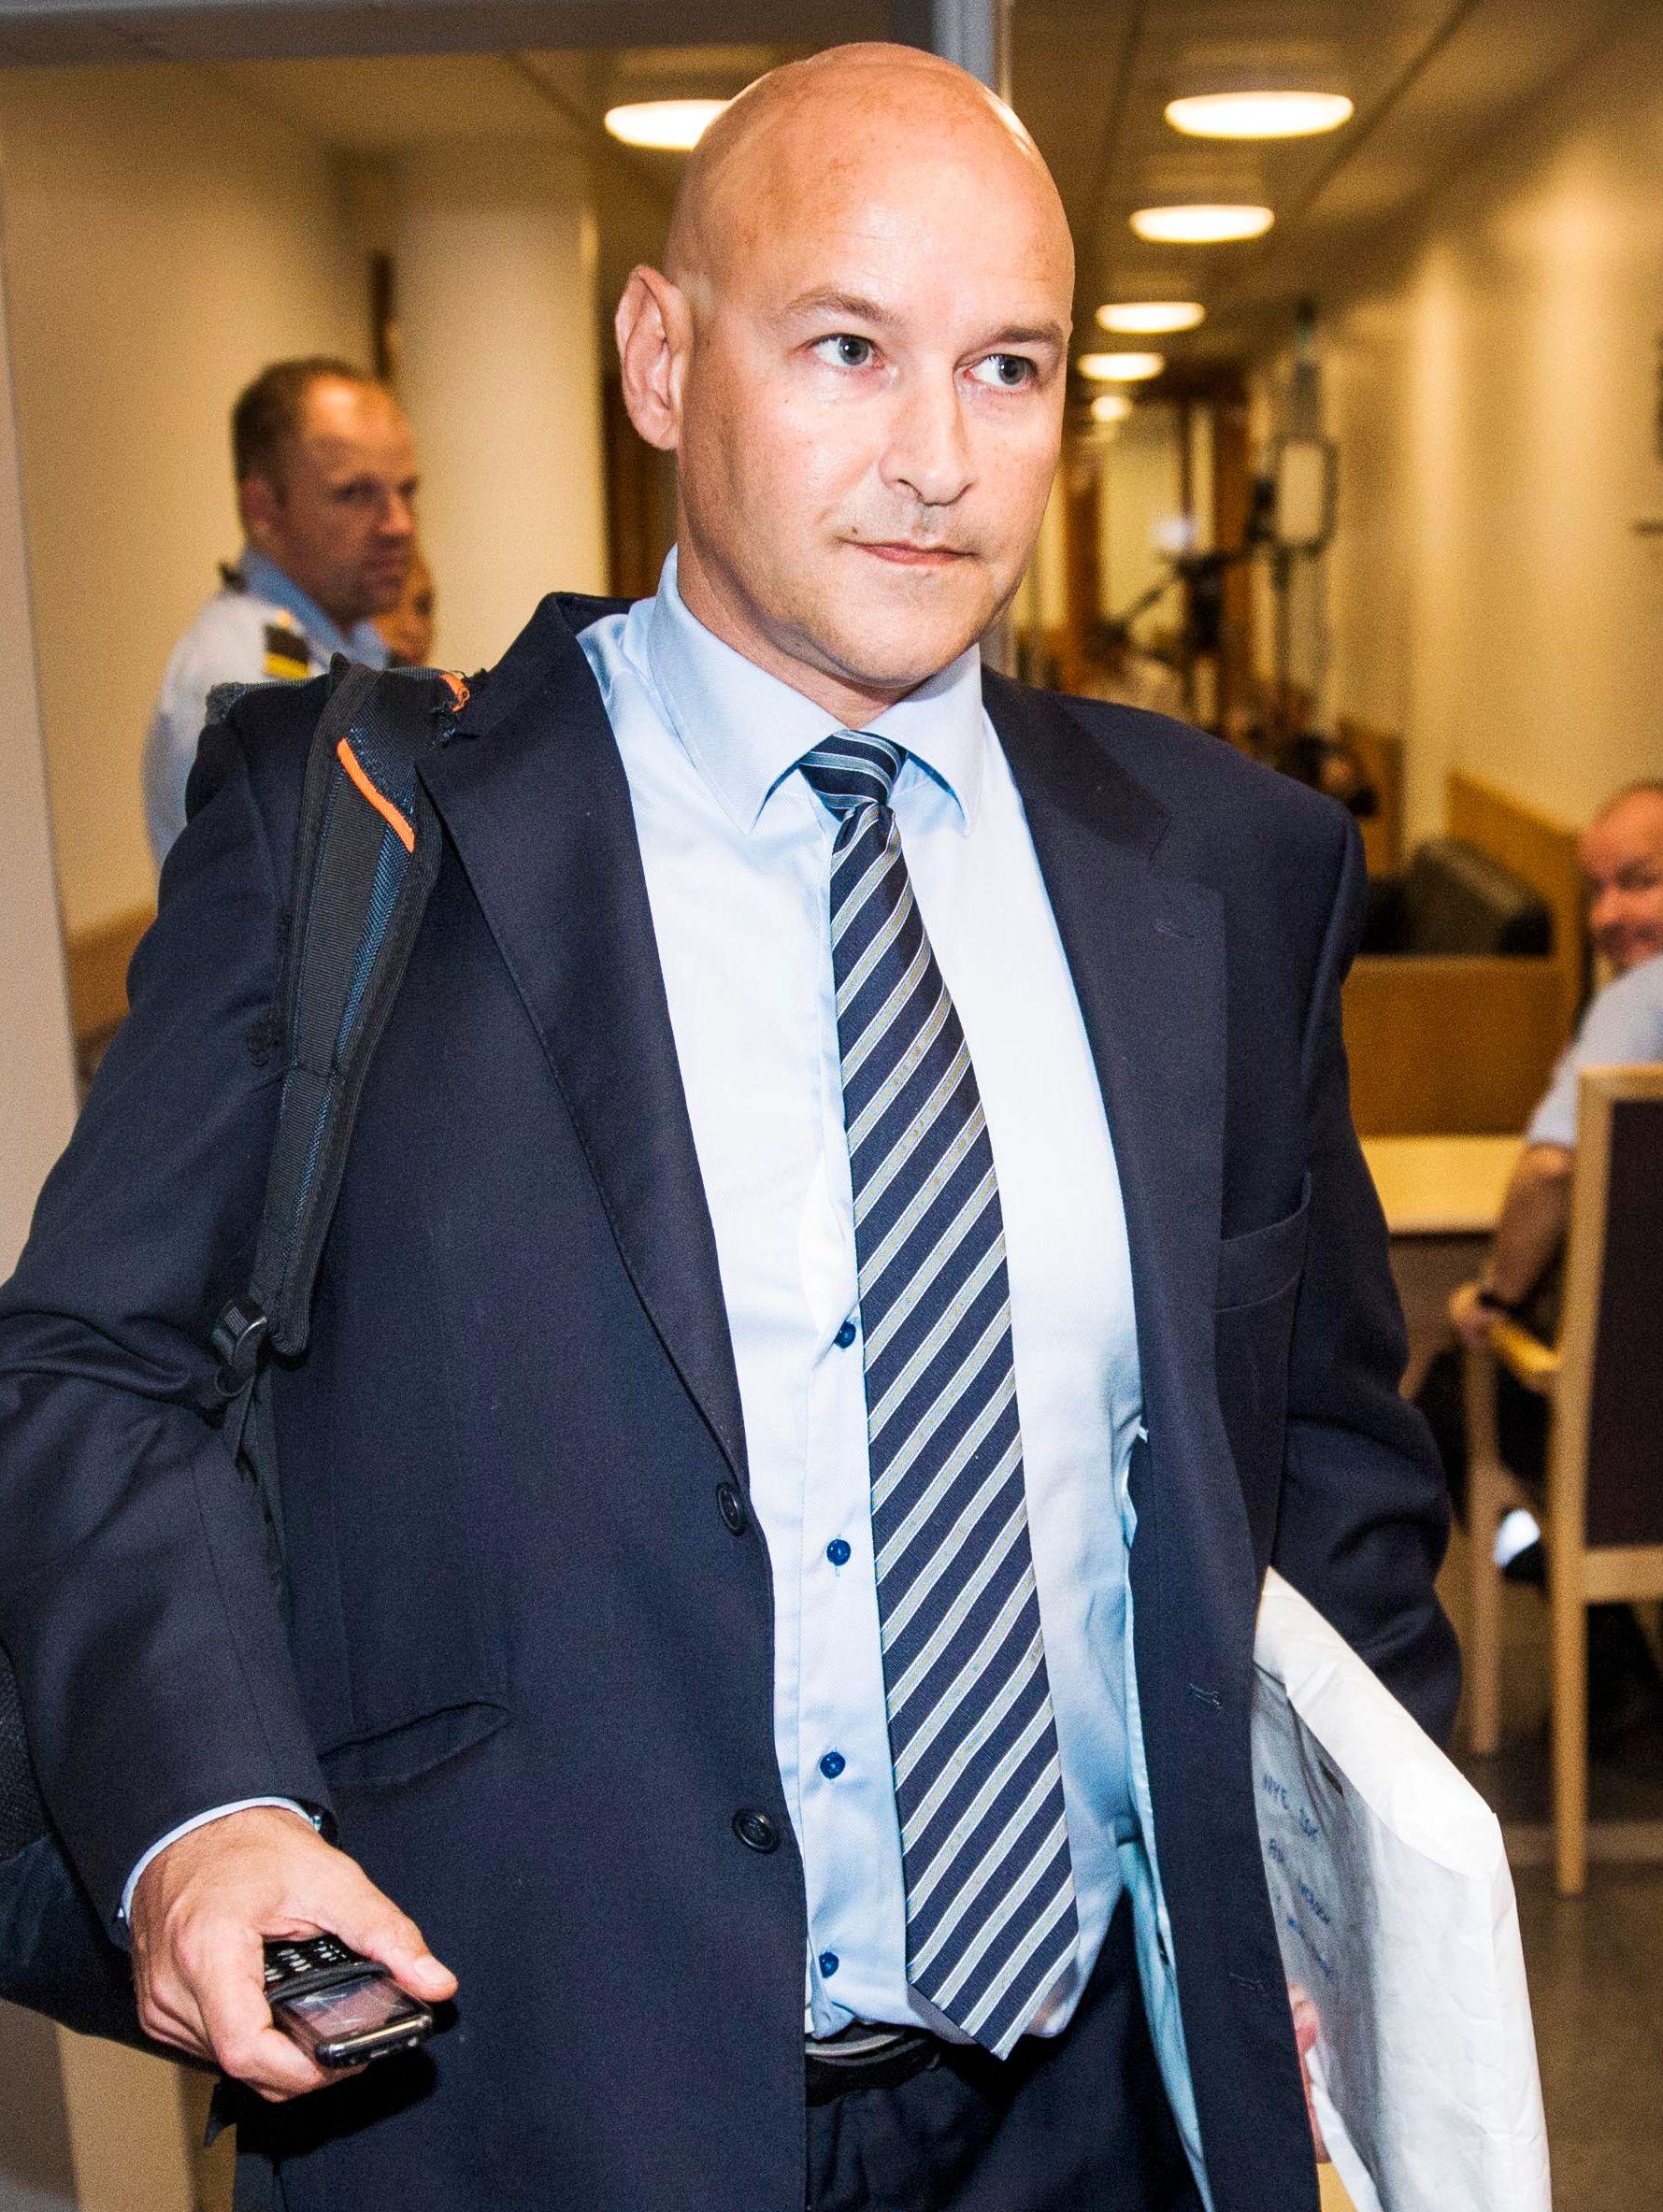 FORSVARER: Advokat Vidar Lind Iversen sier at klienten nekter straffskyld.